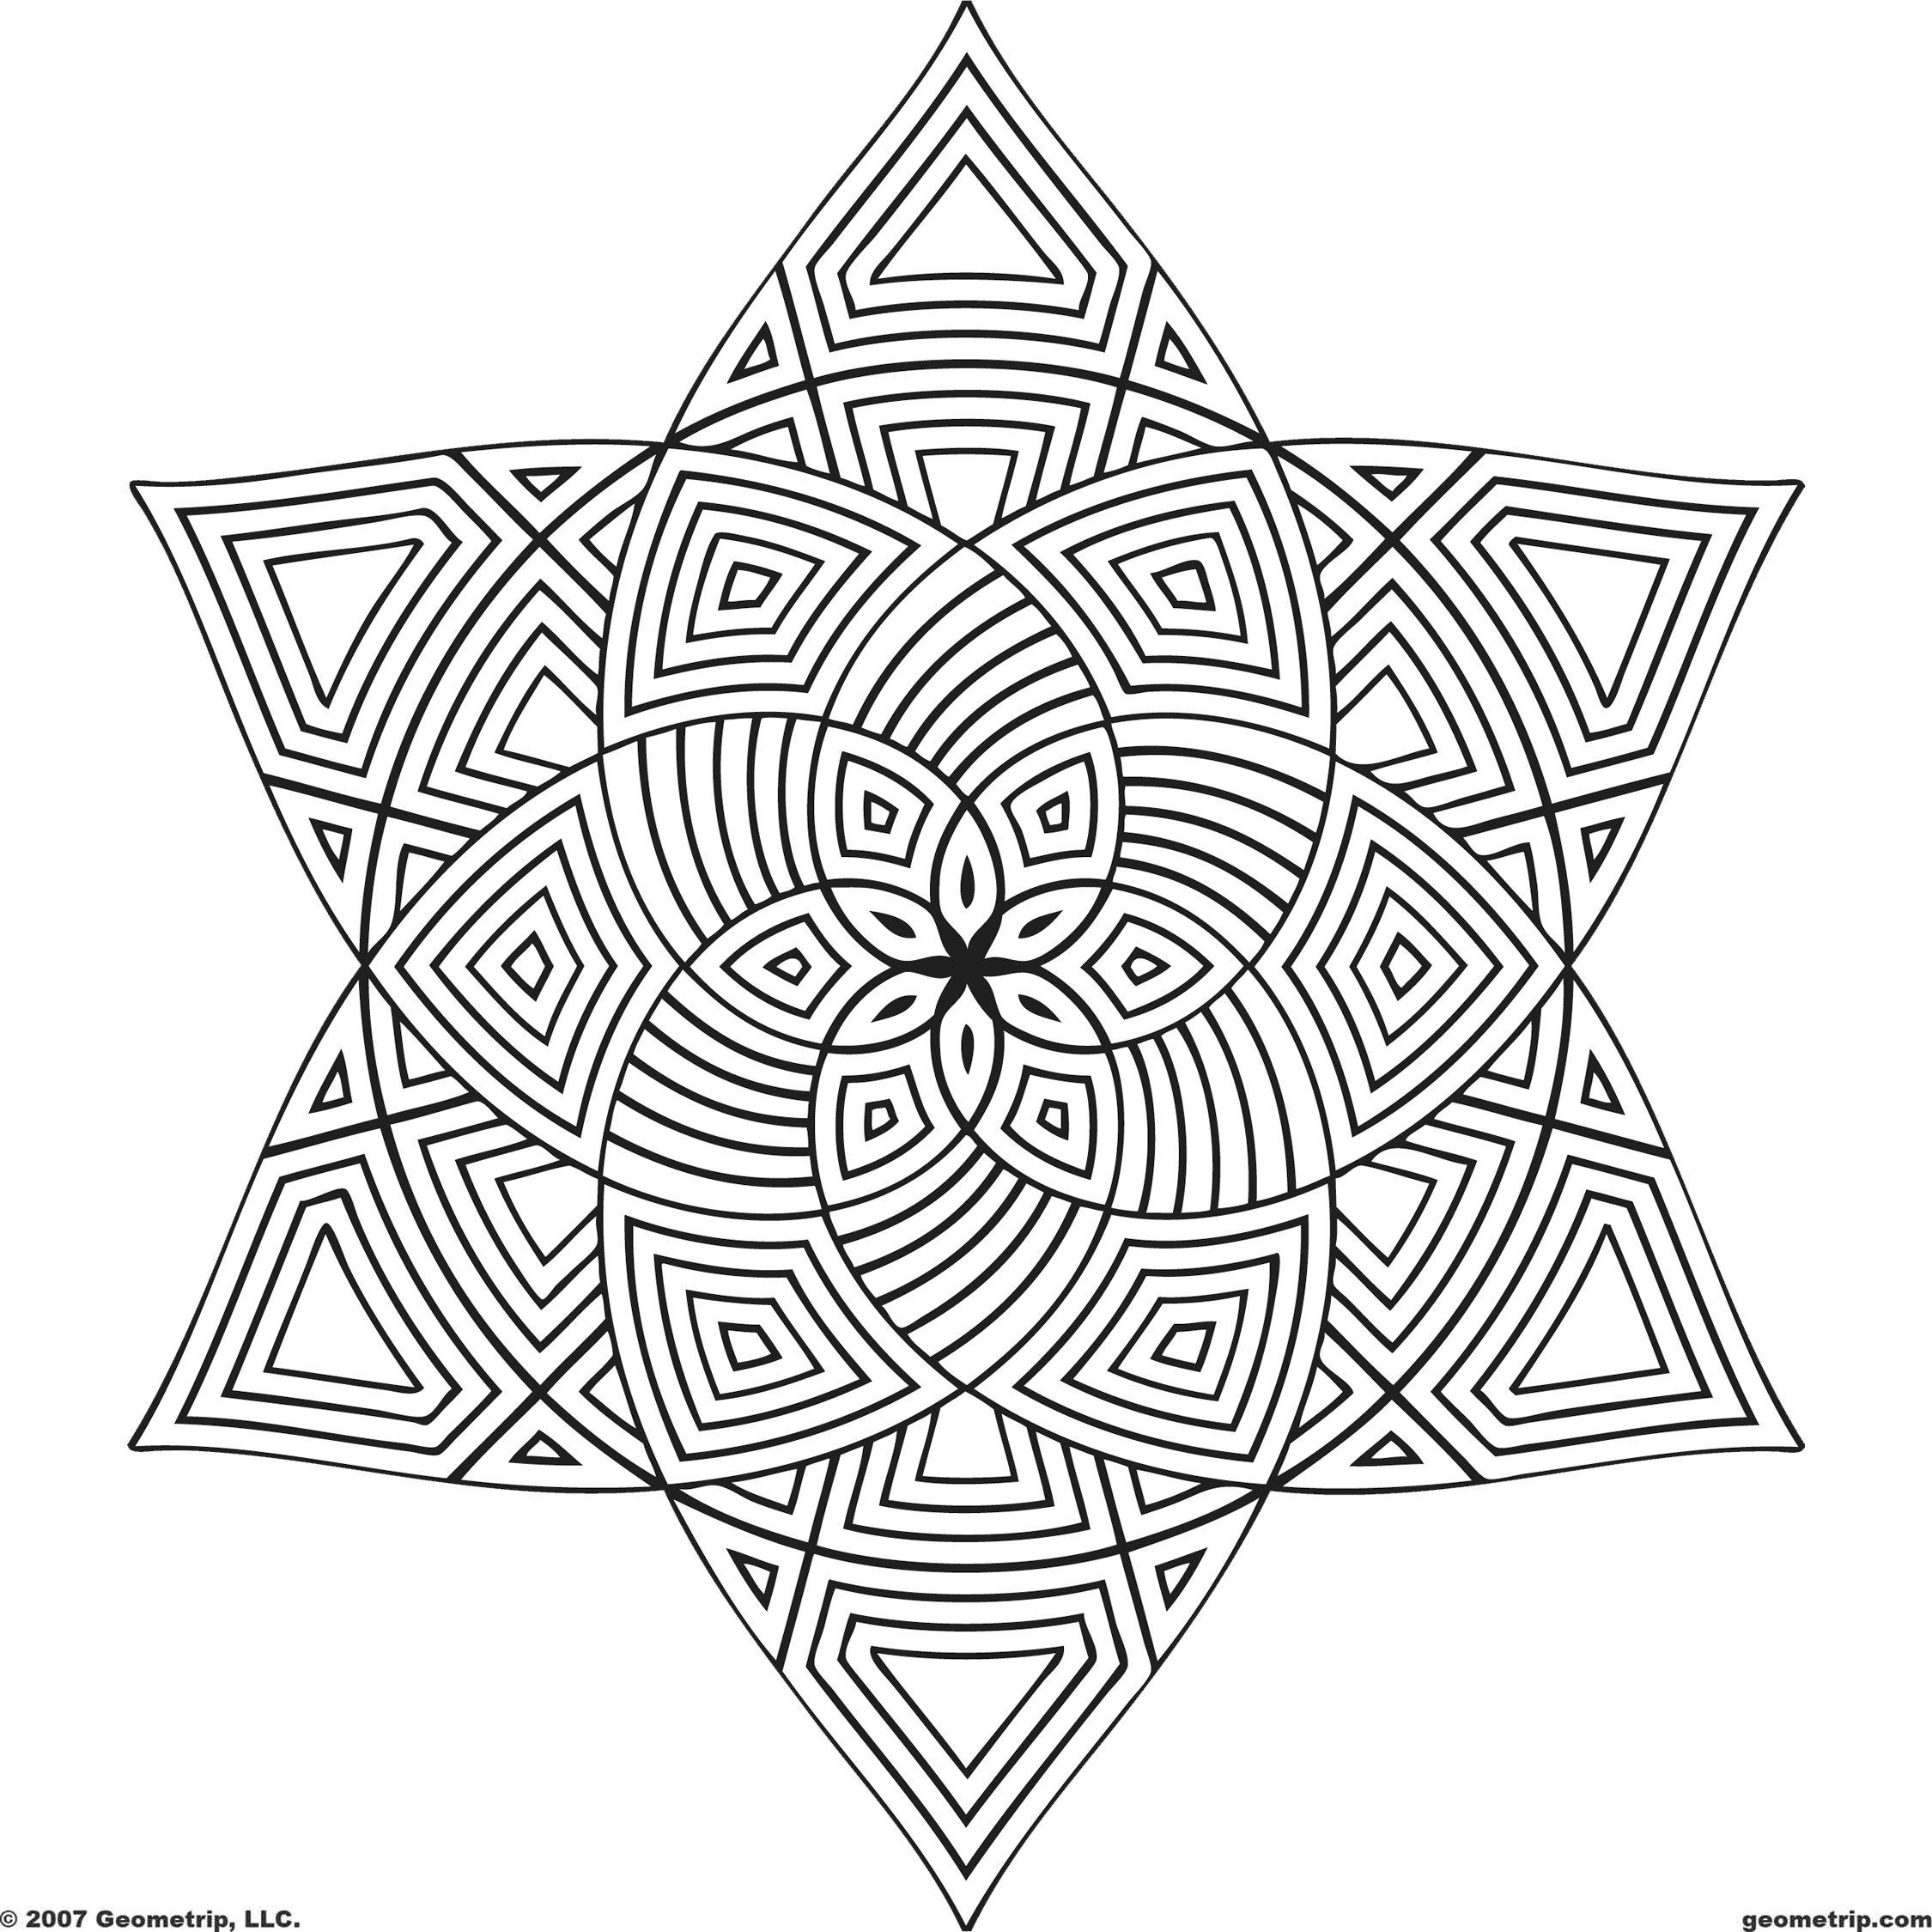 Geometrip Com Free Geometric Coloring Designs Shapes Geometric Coloring Pages Pattern Coloring Pages Mandala Coloring Pages